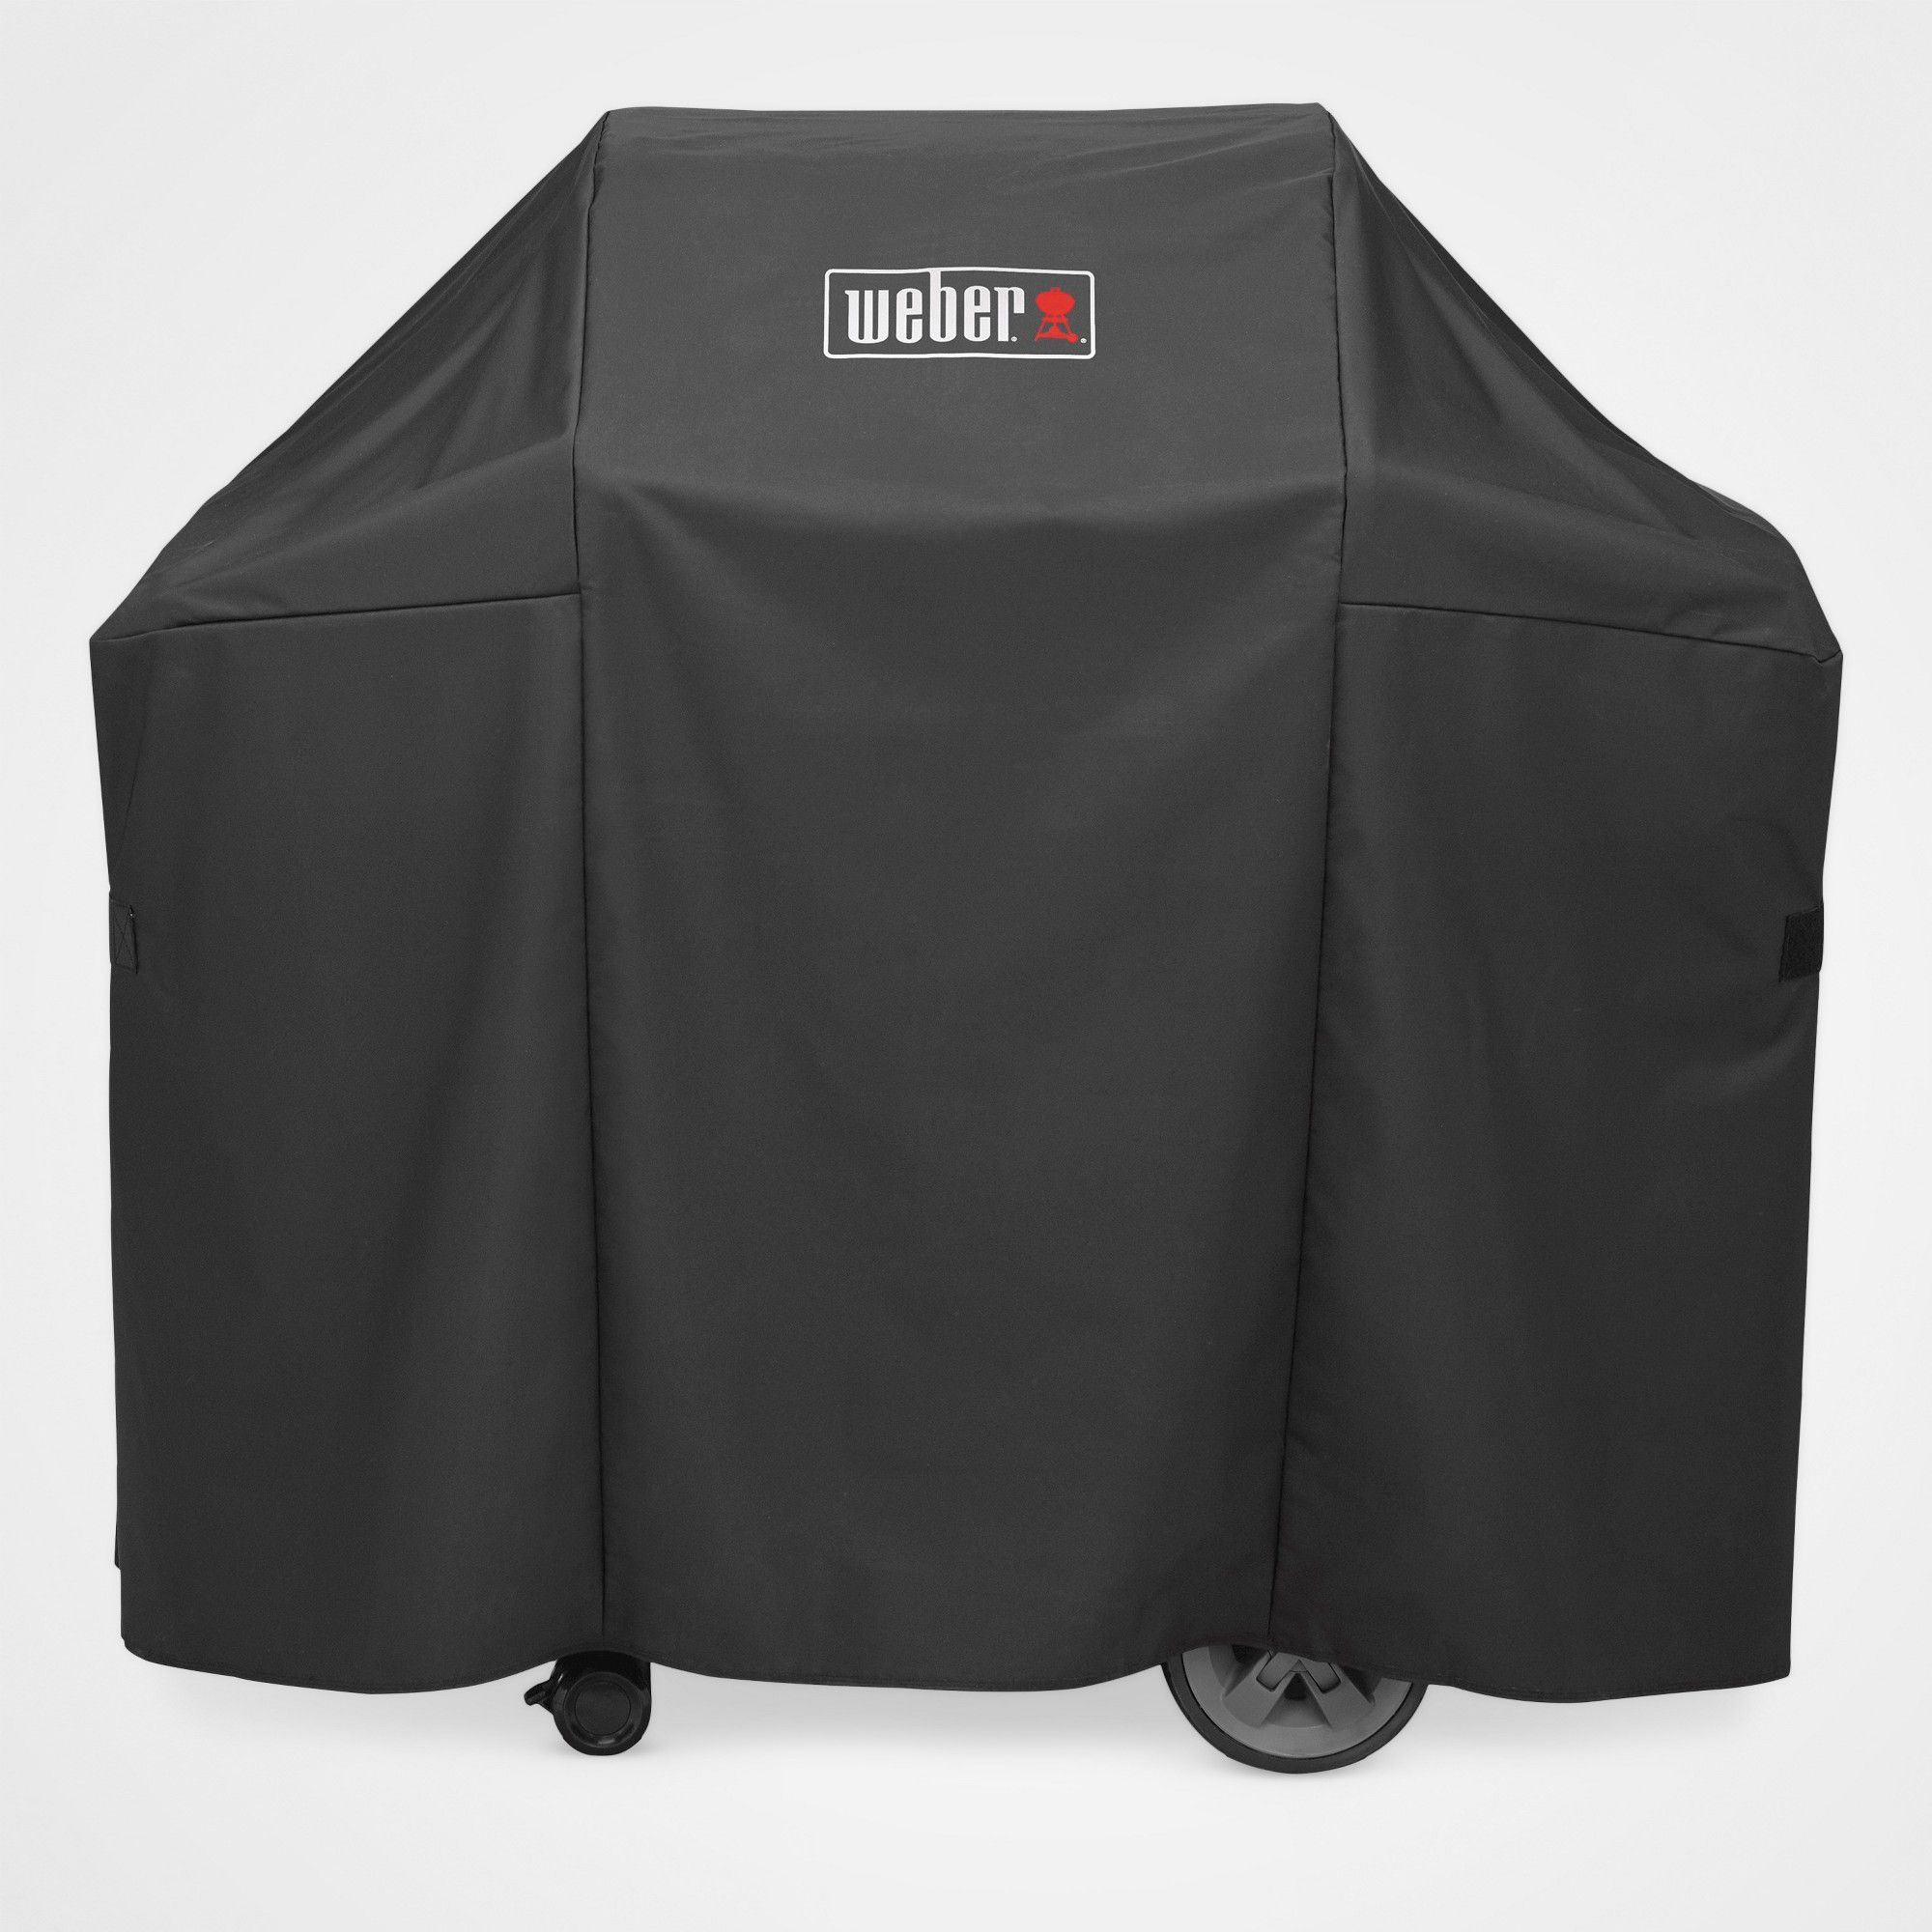 Weber Genesis Ii 2 Burner Premium Cover Black Weber Grill Cover Gas Grill Covers Grilling